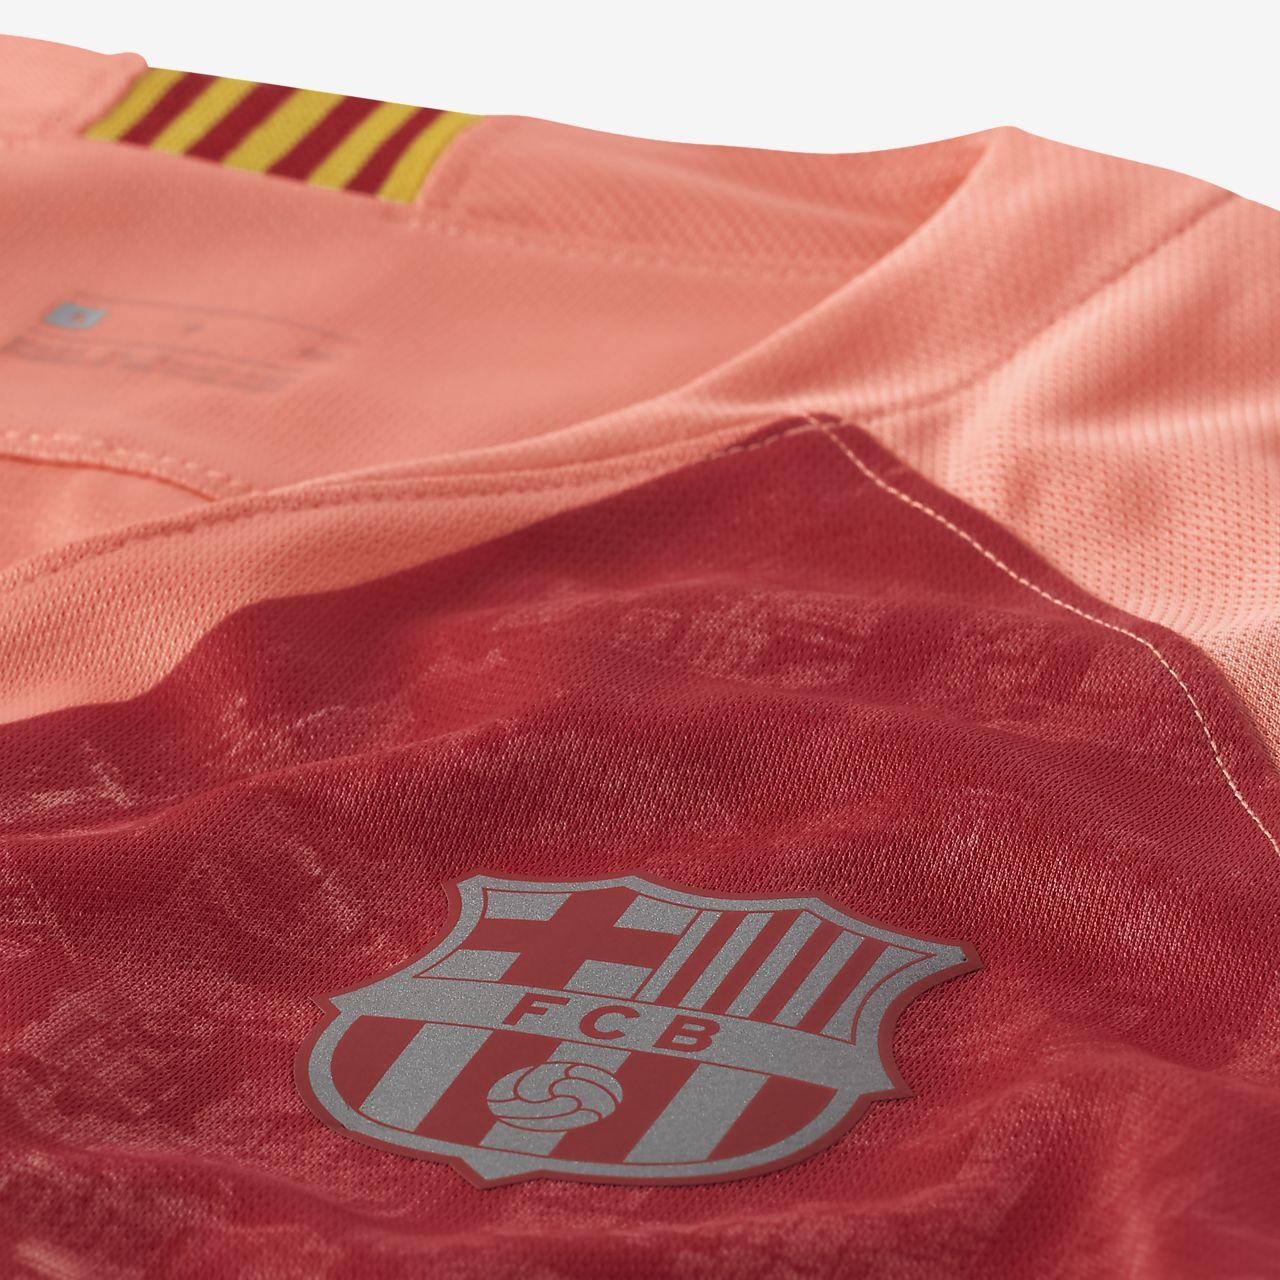 c81794a34a1 FC Barcelona 2018/19 Stadium Third Women's Football Shirt. Nike.com ZA